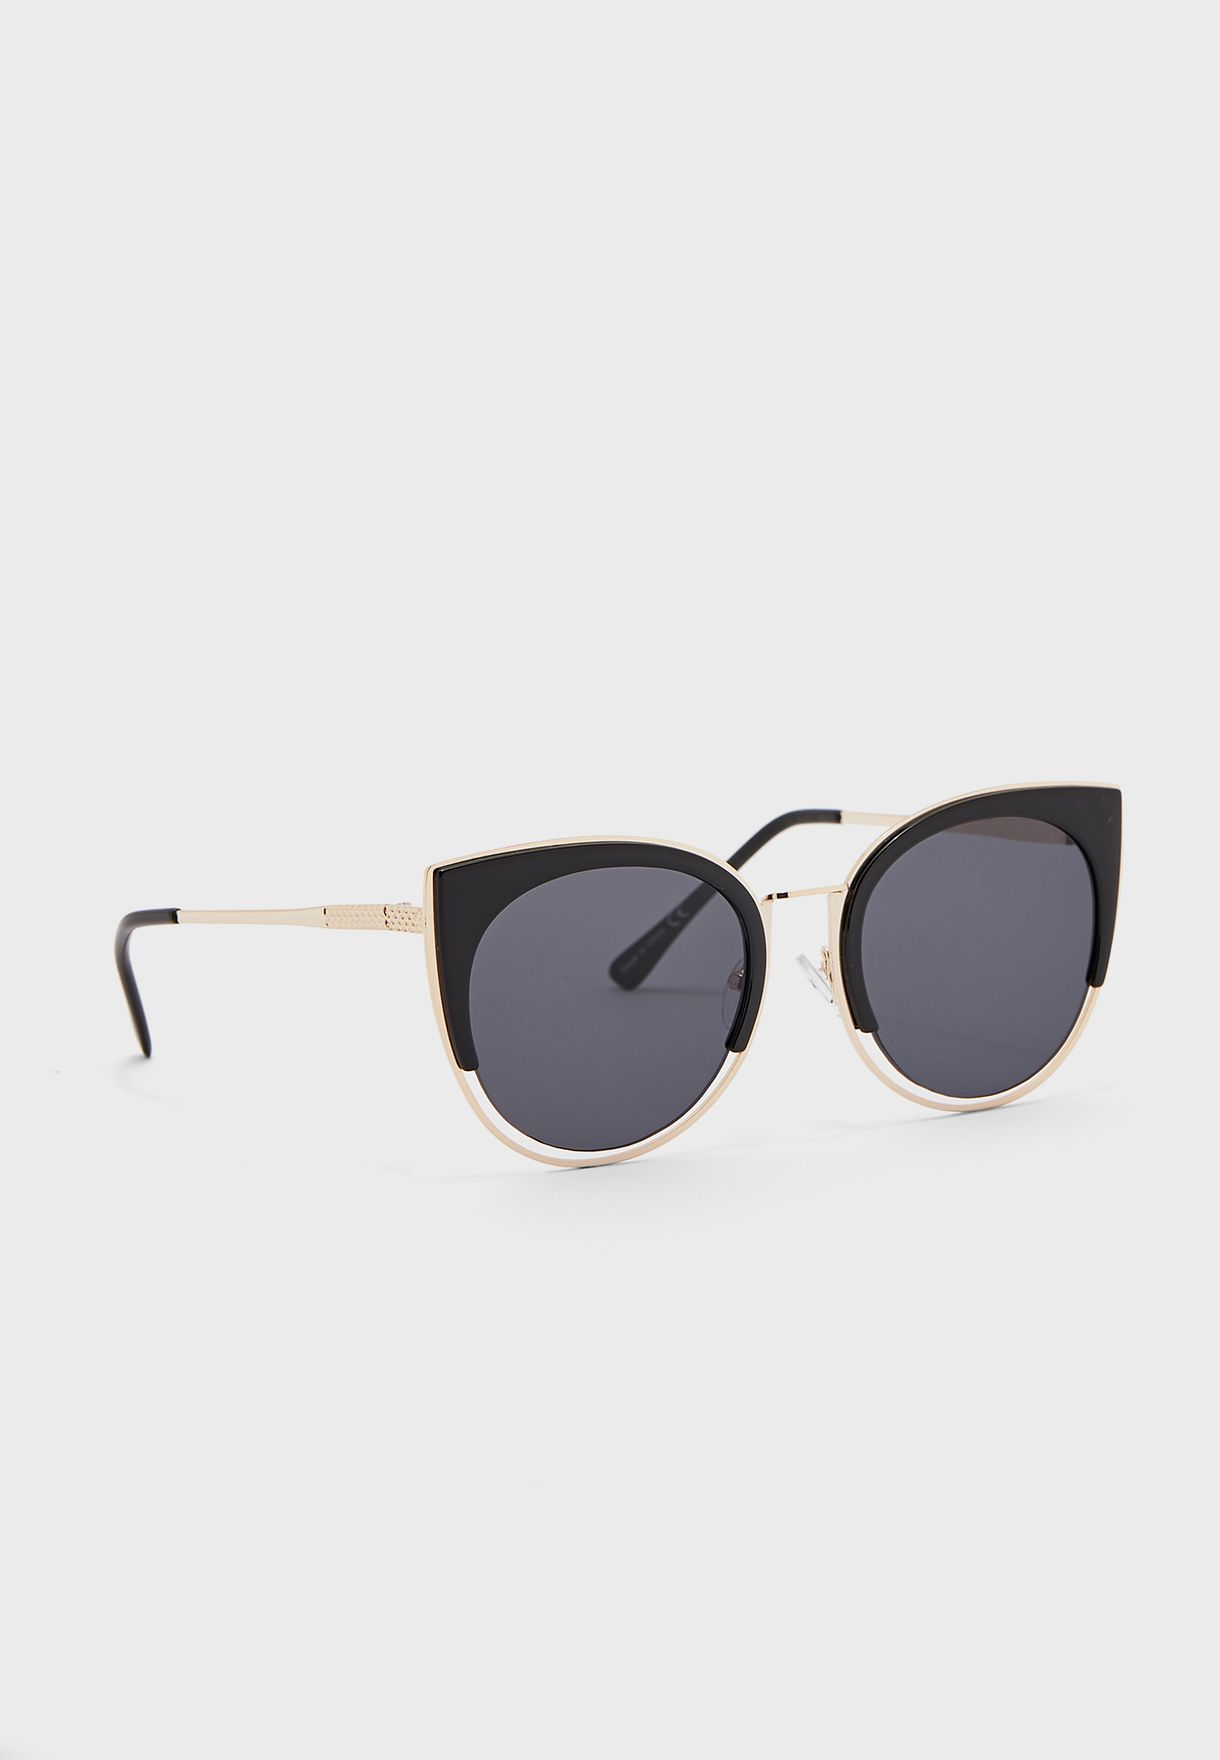 Arell Round Cateye Sunglasses